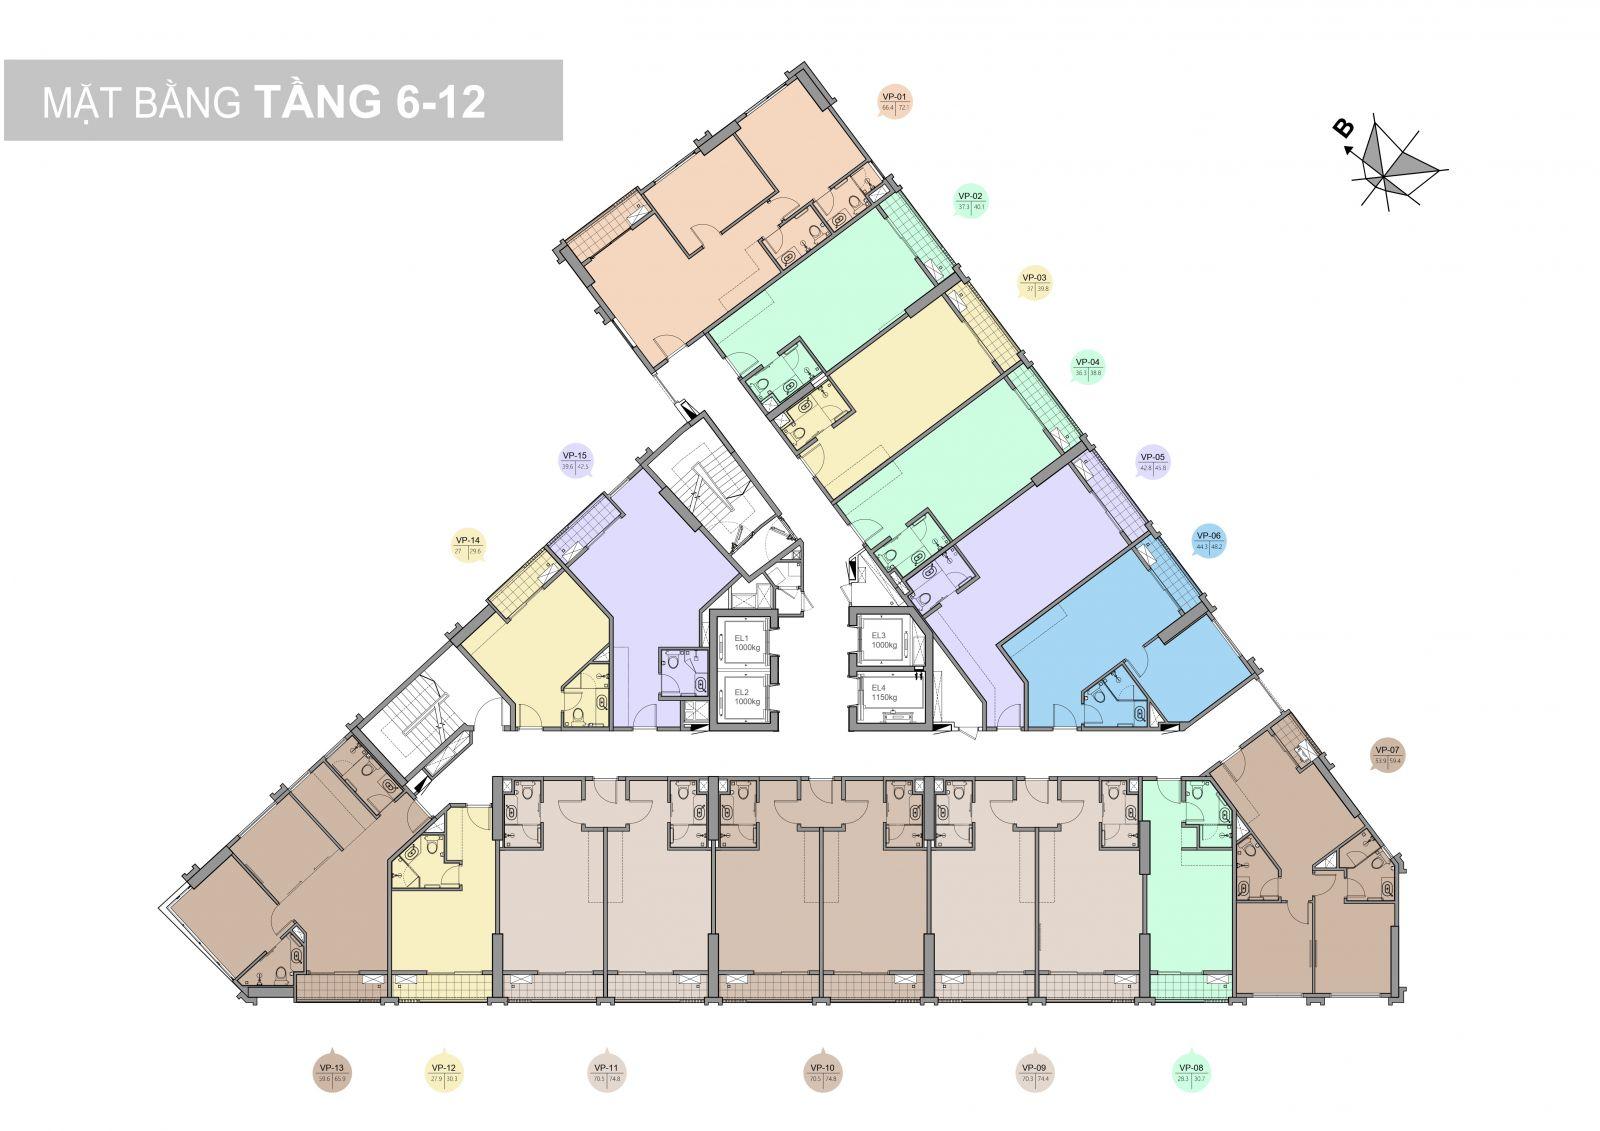 mặt bằng tầng 6-12